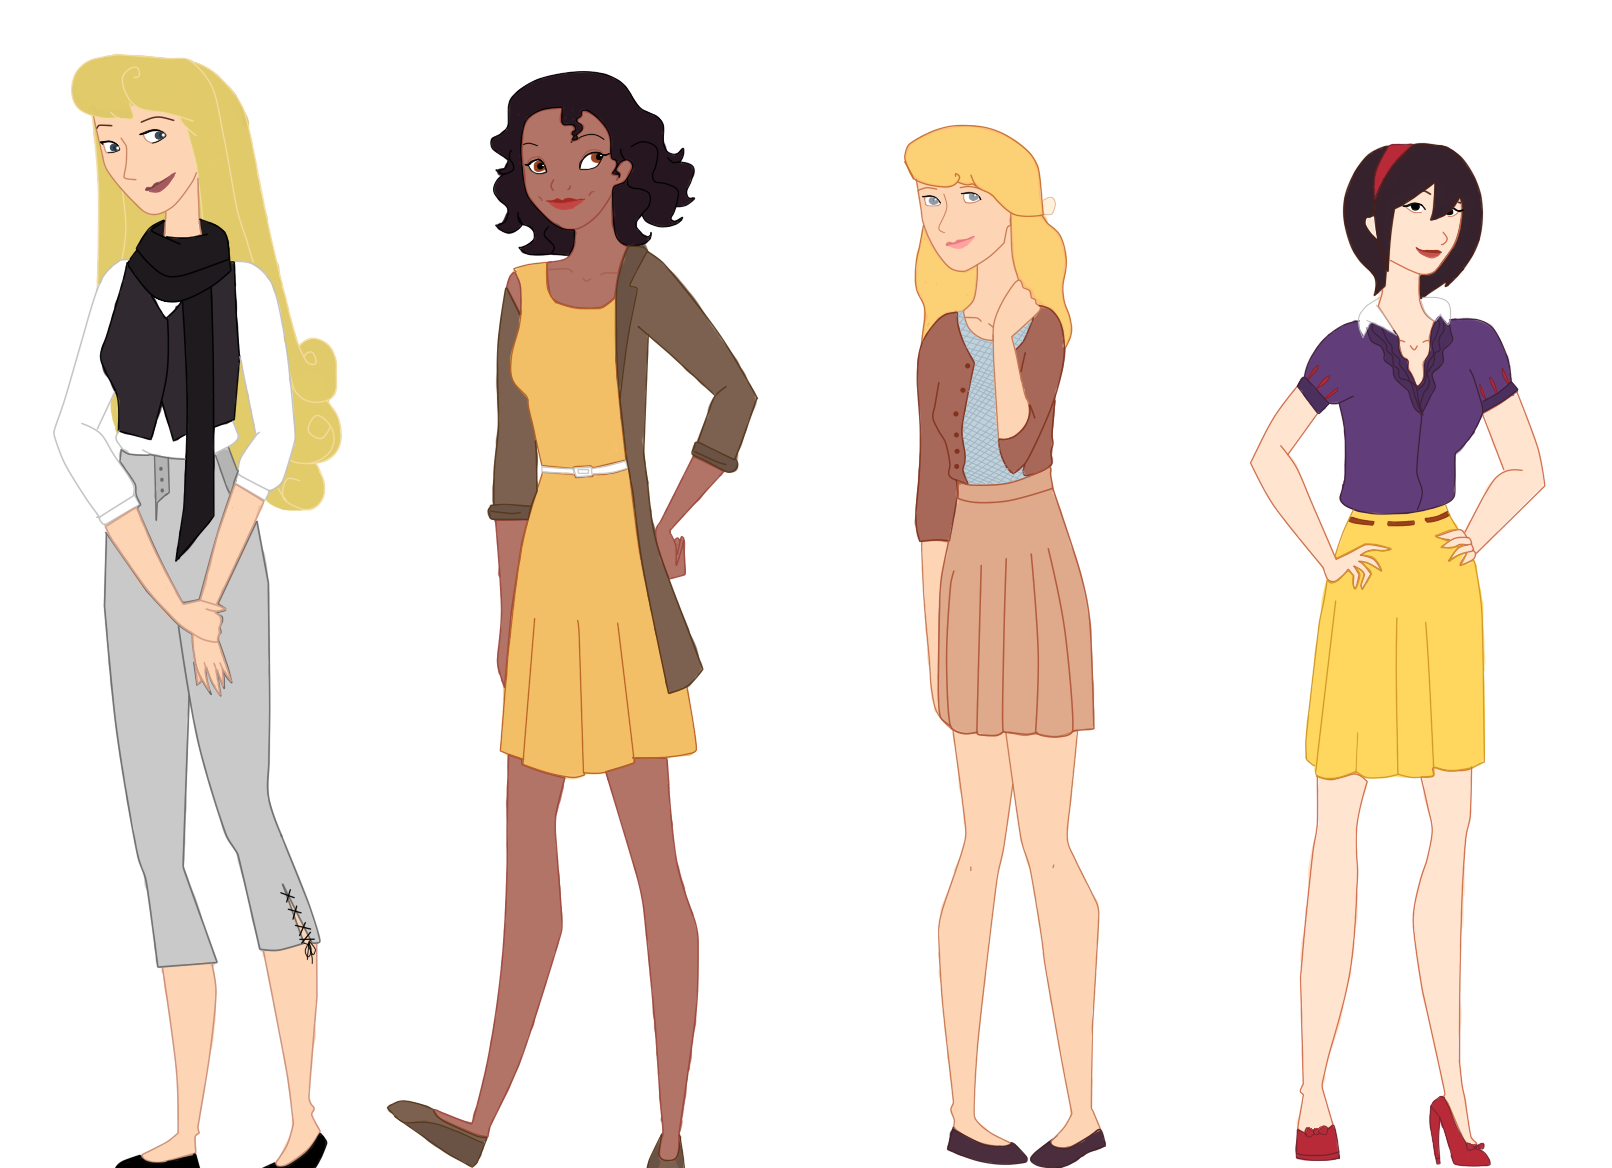 Modern disney princesses by itoriiii on deviantart